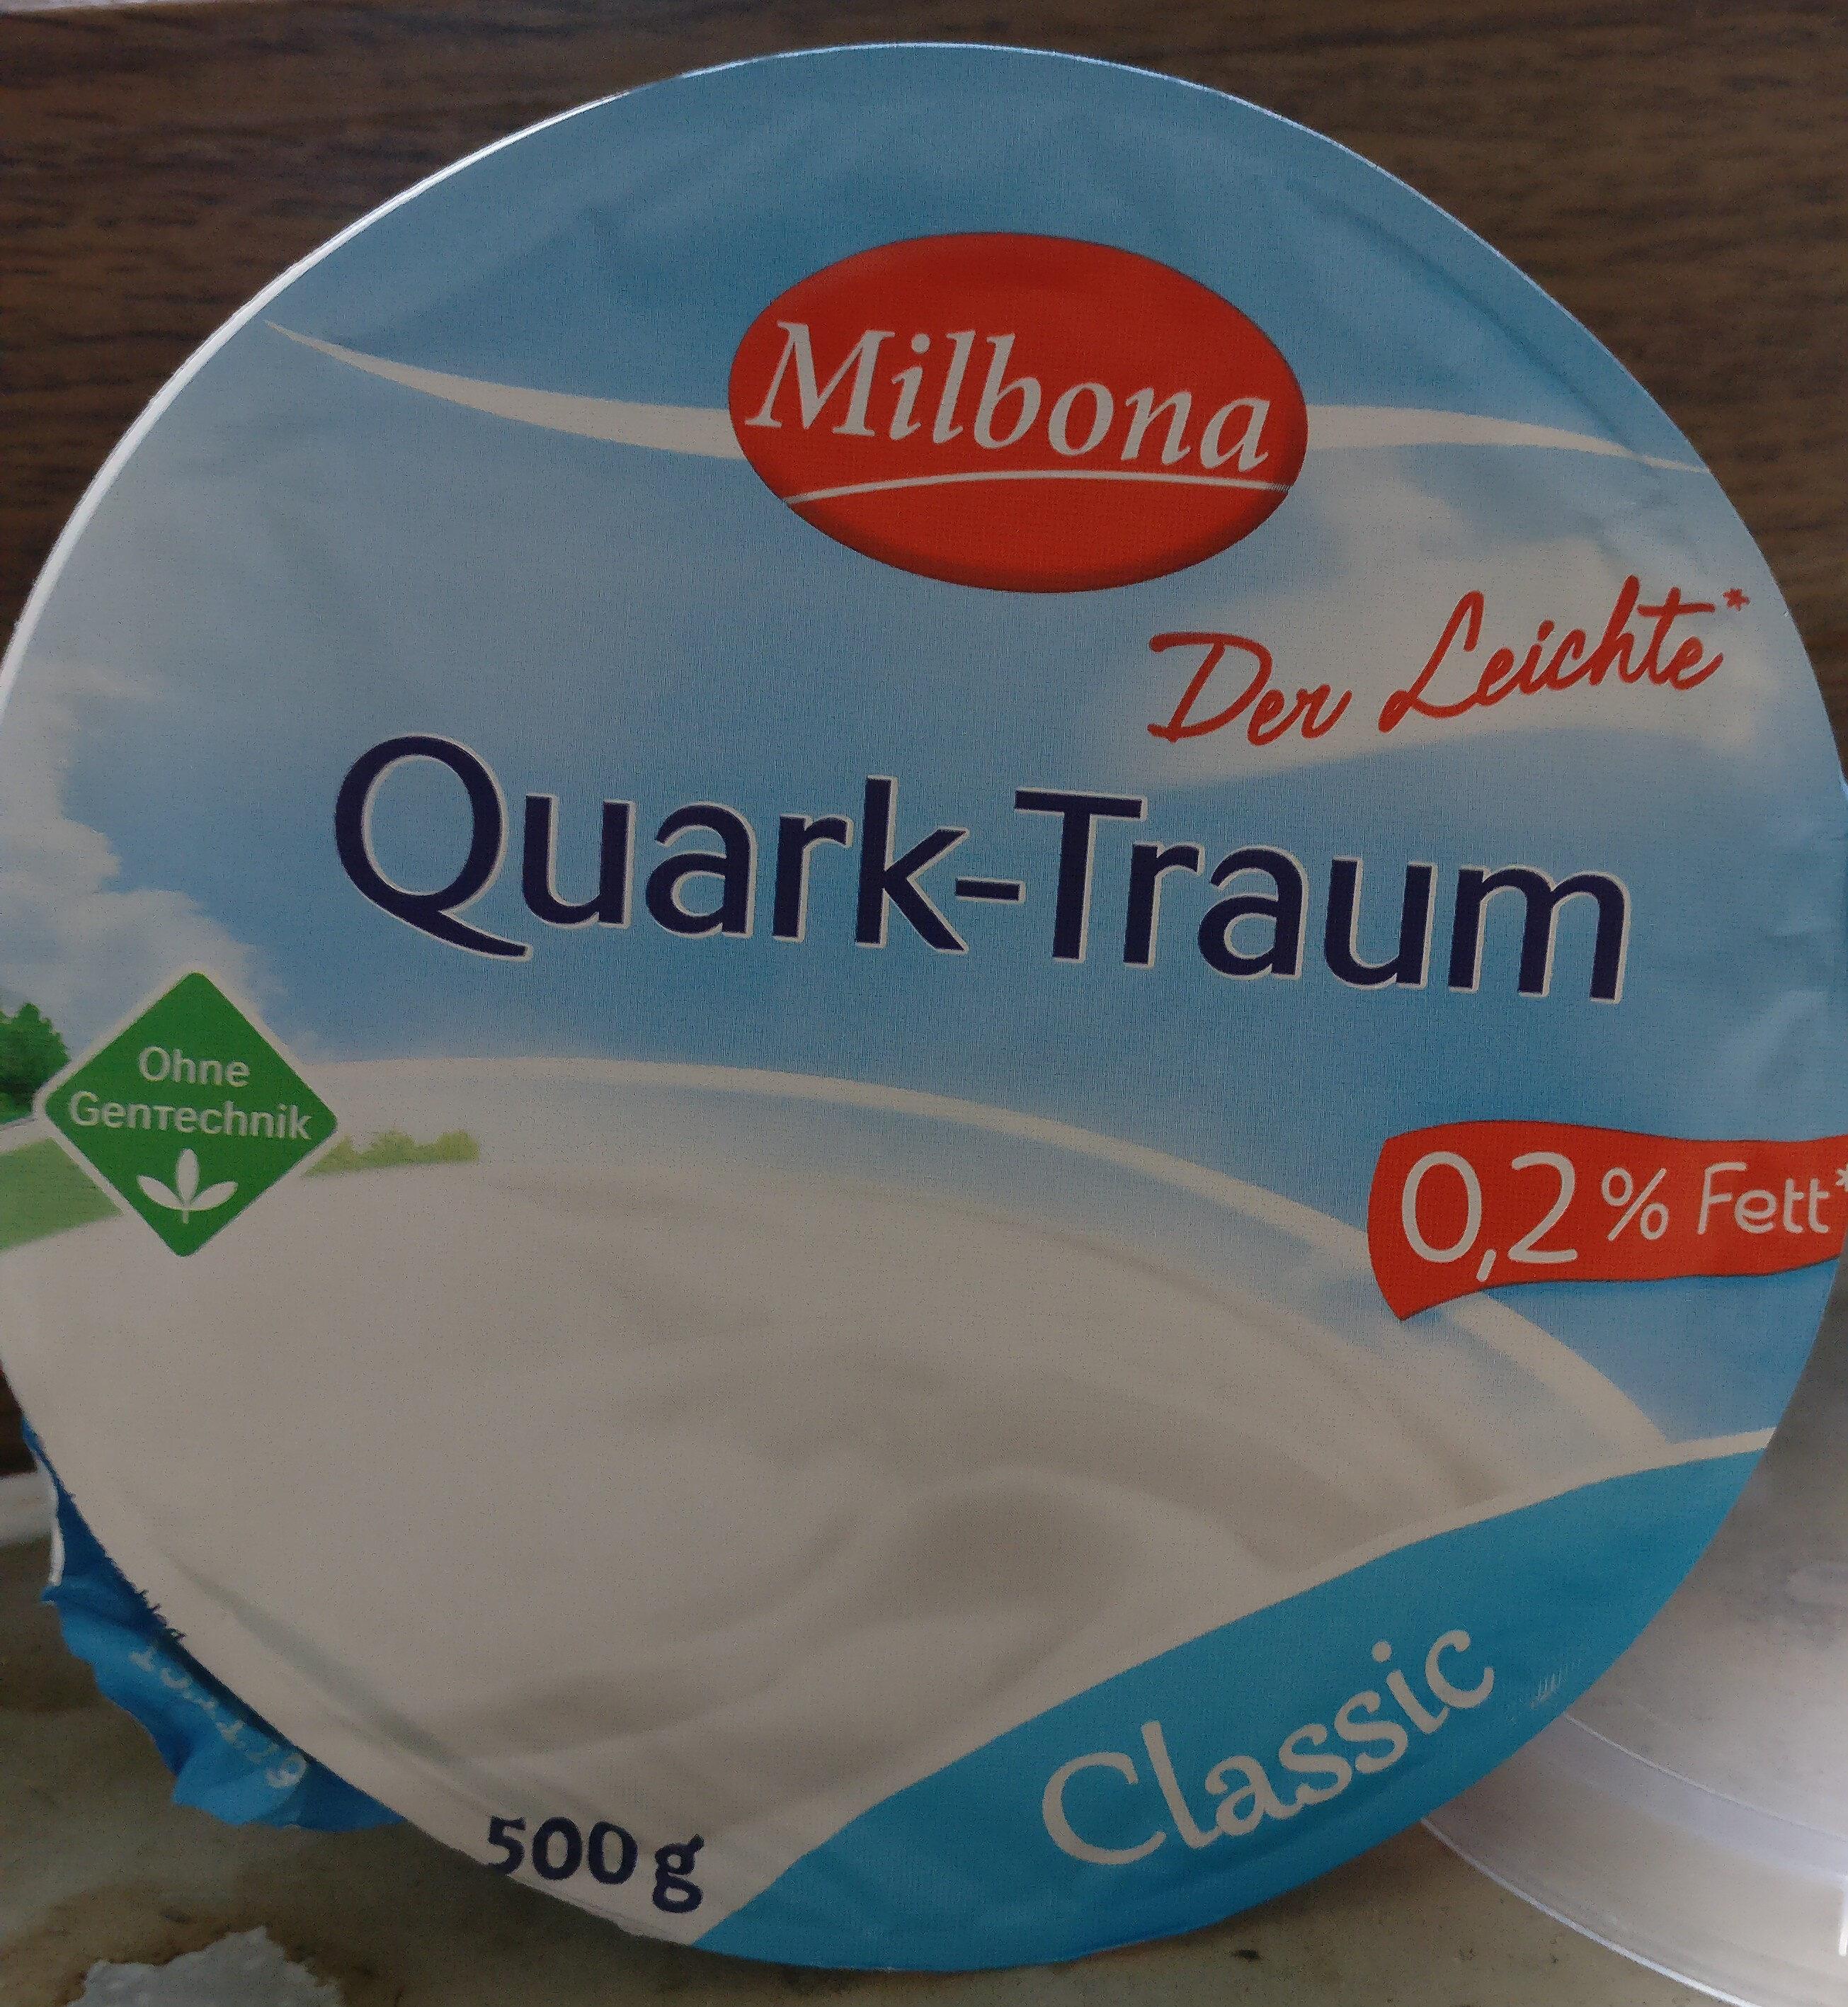 Quark-Traum Classic - Der Leichte - Product